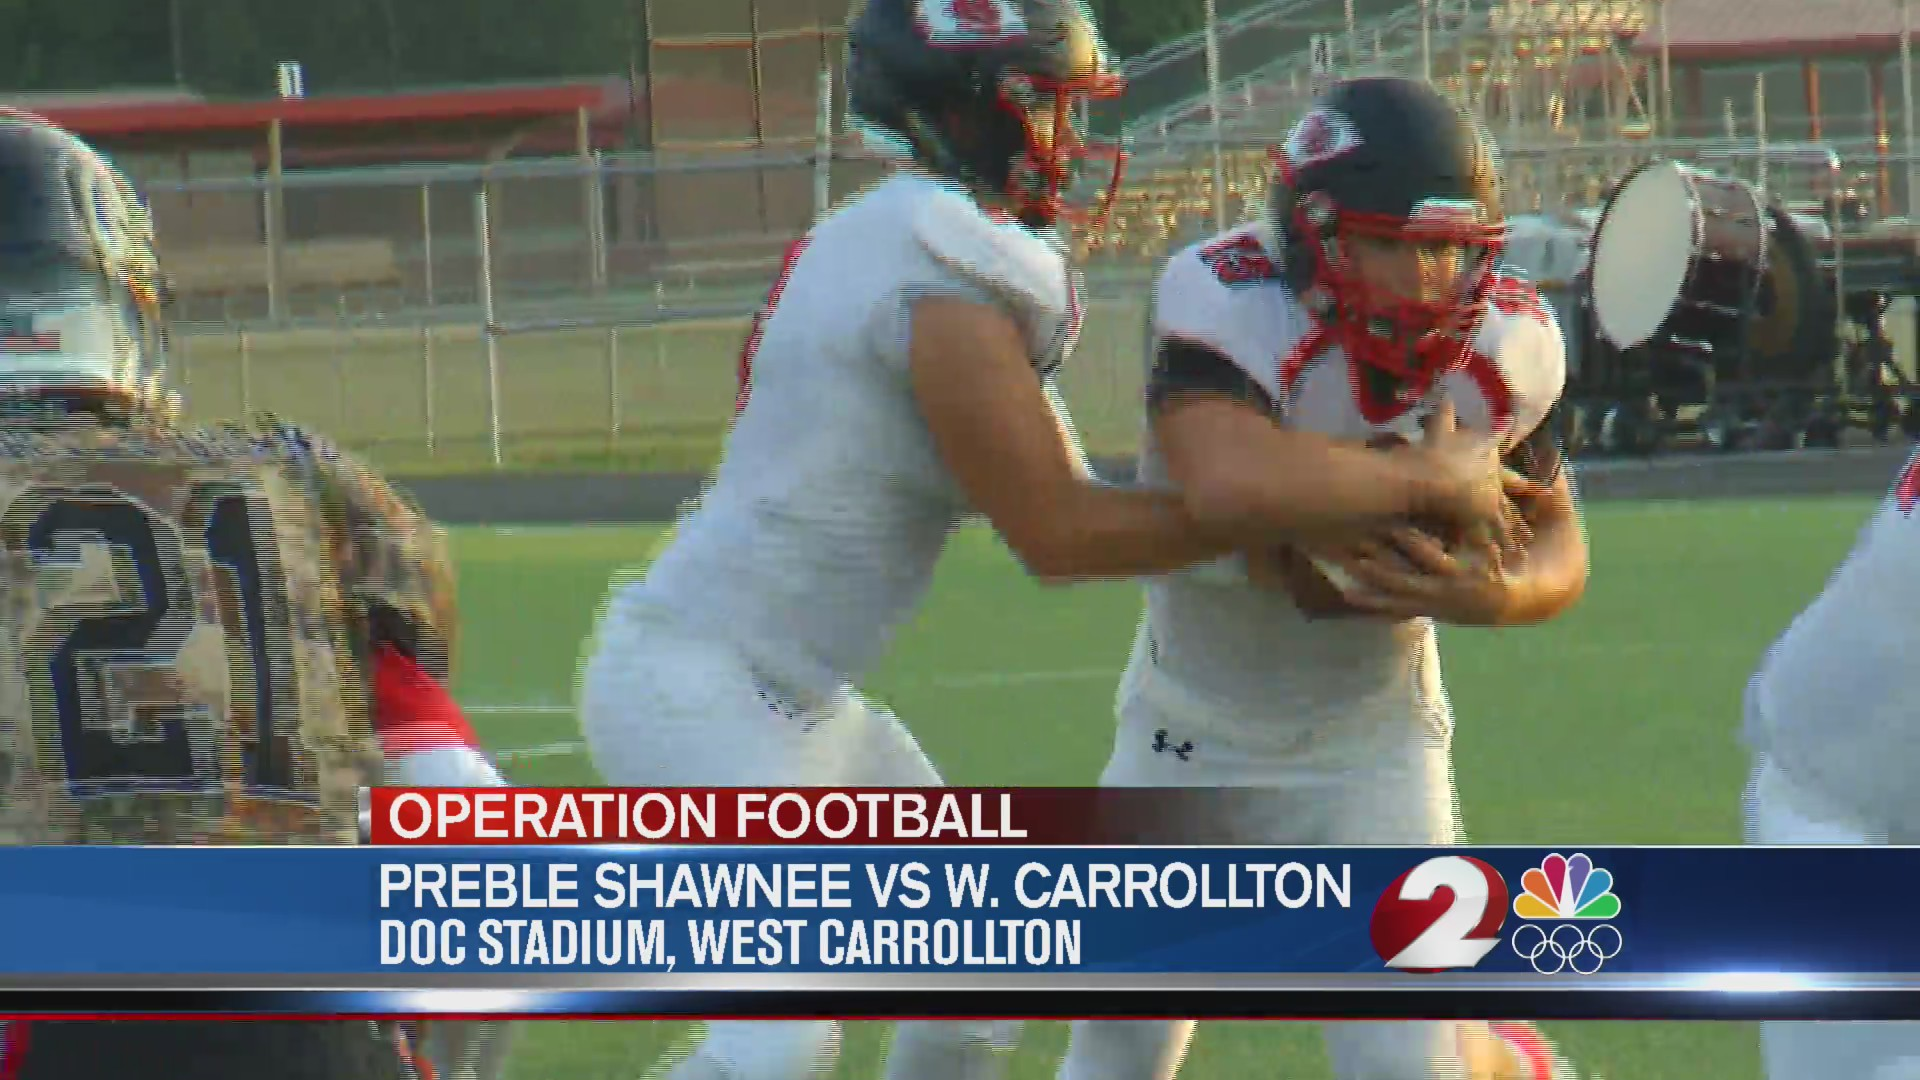 Operation Football Week 3: Preble Shawnee at West Carrollton